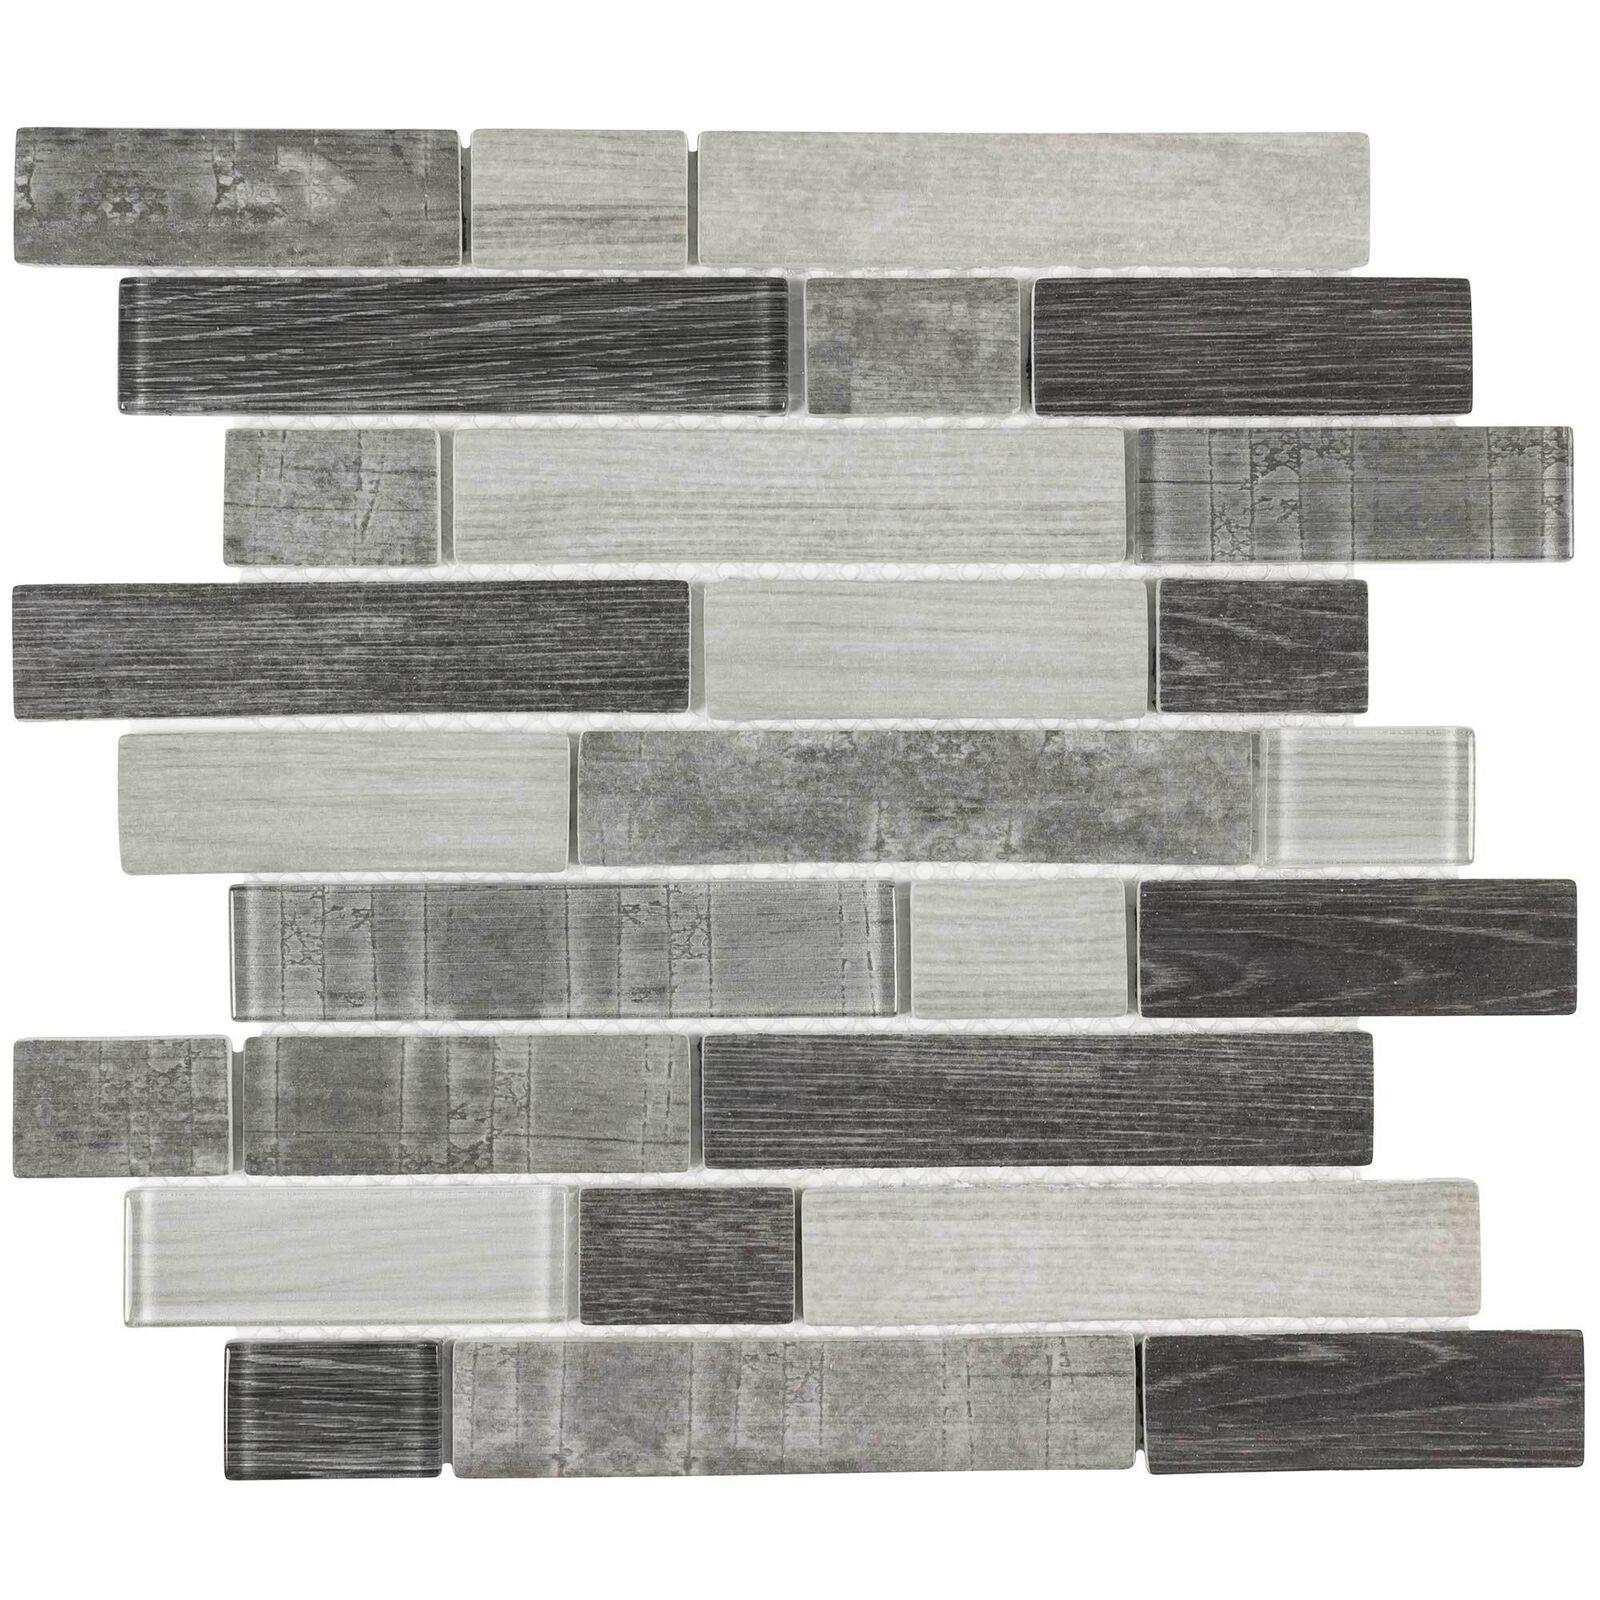 Modern Linear Grey Glass Mosaic Tile Backsplash Kitchen Wall Bathroom Mto0335 For Sale Online Ebay